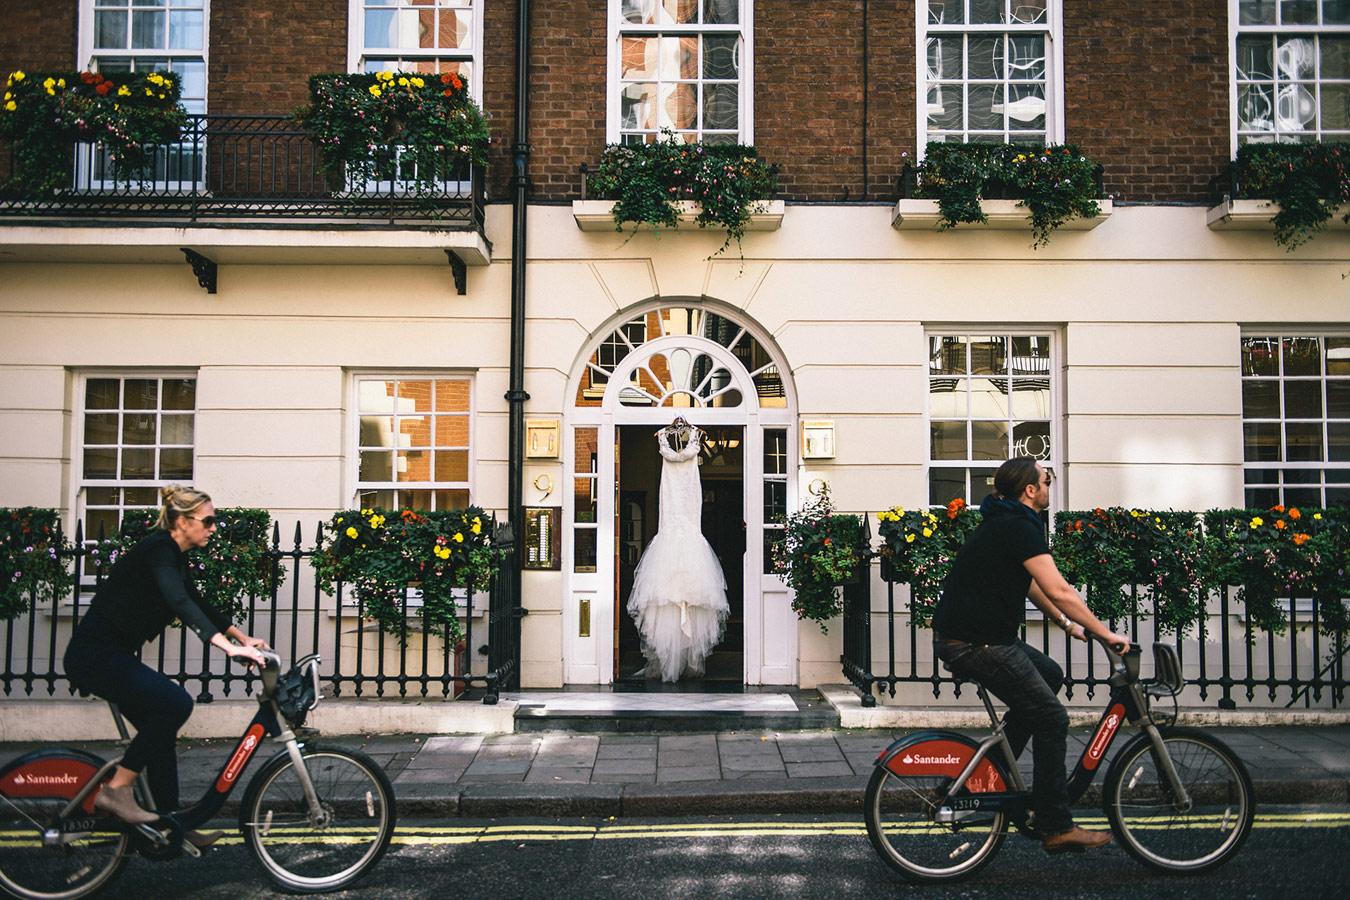 © Paulo Santos, Wallsend, Tyne & Wear, United Kingdom, 2st place in category Professional : Wedding Details, Rangefinder Wedding Contest 2017 Winners